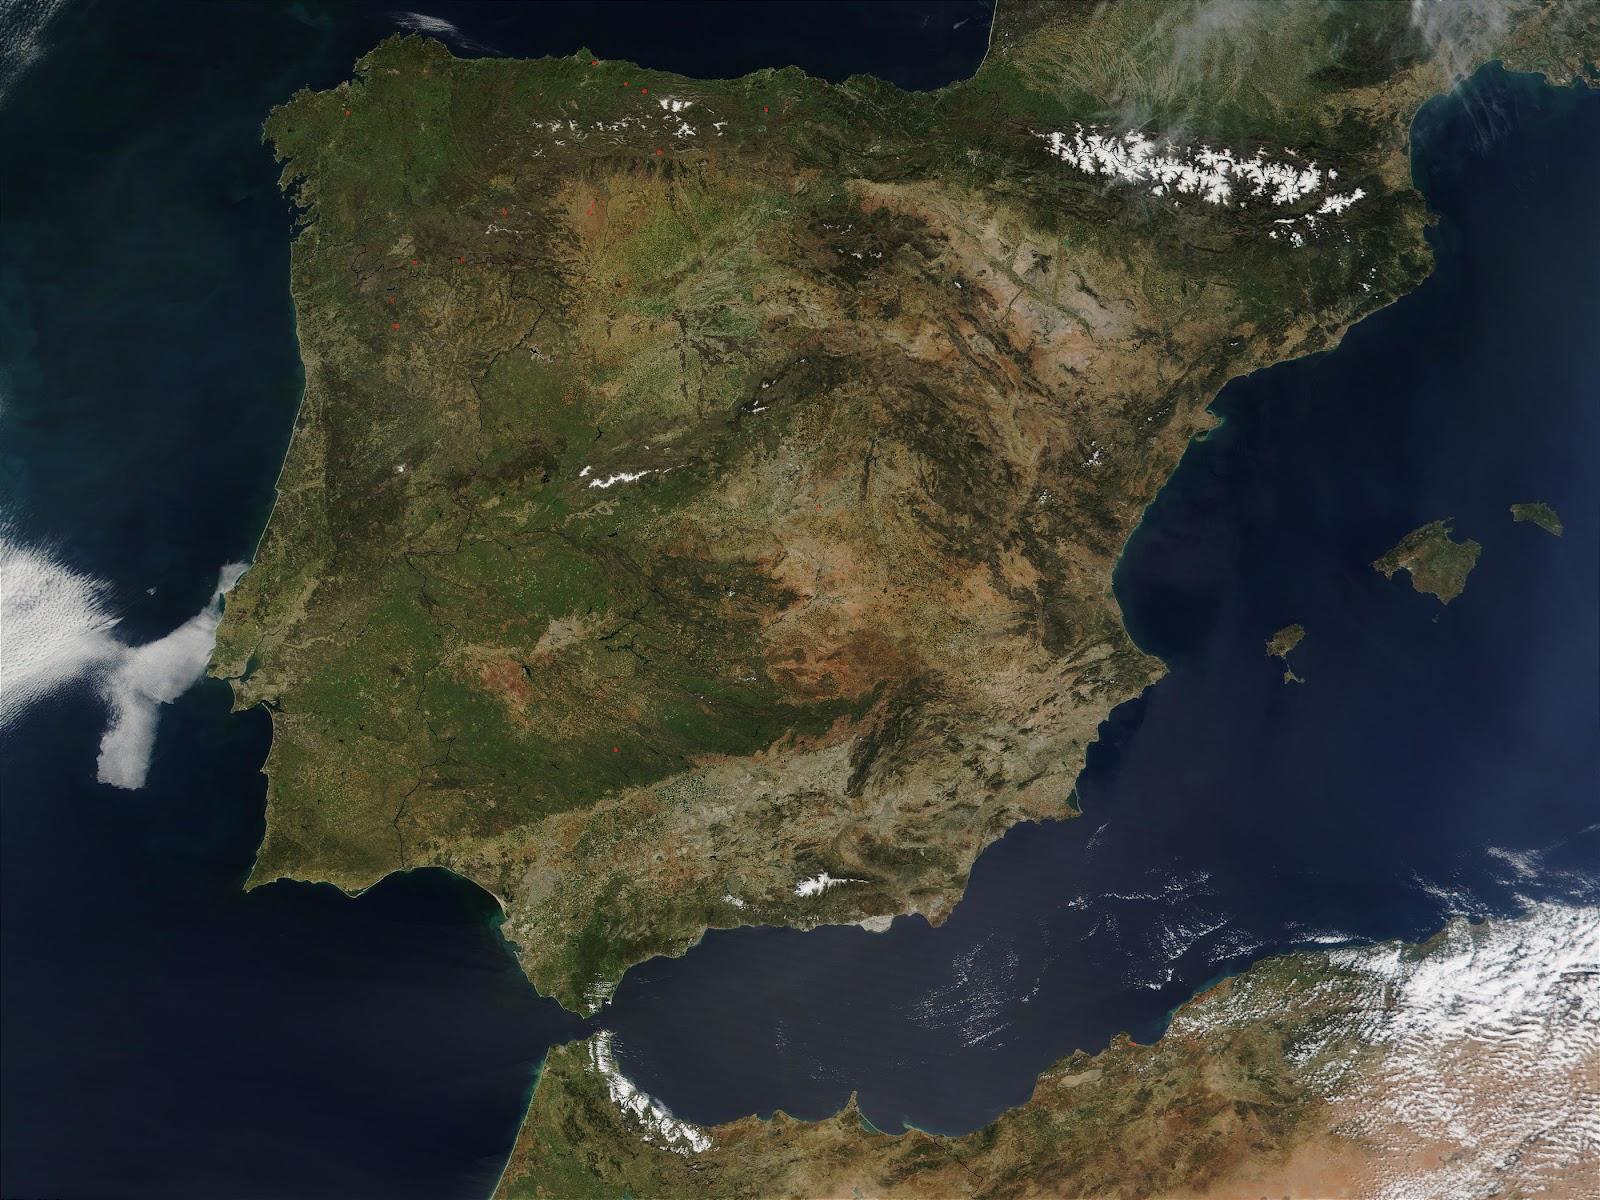 Mapa Satelital De España.Biqfr Csic Espana Virtual Un Puente Para Unir La